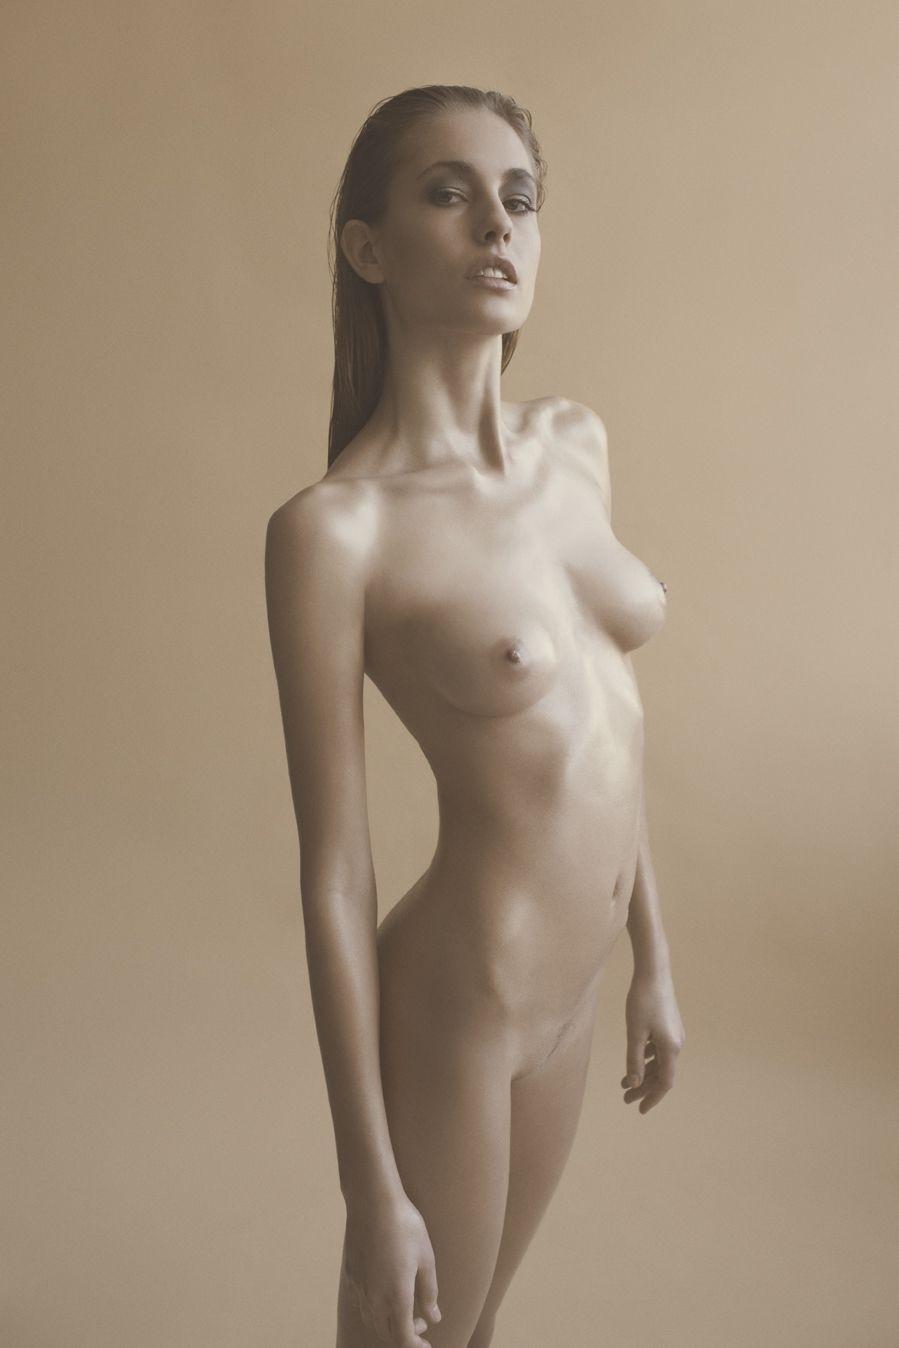 Avatar the last air bender nude